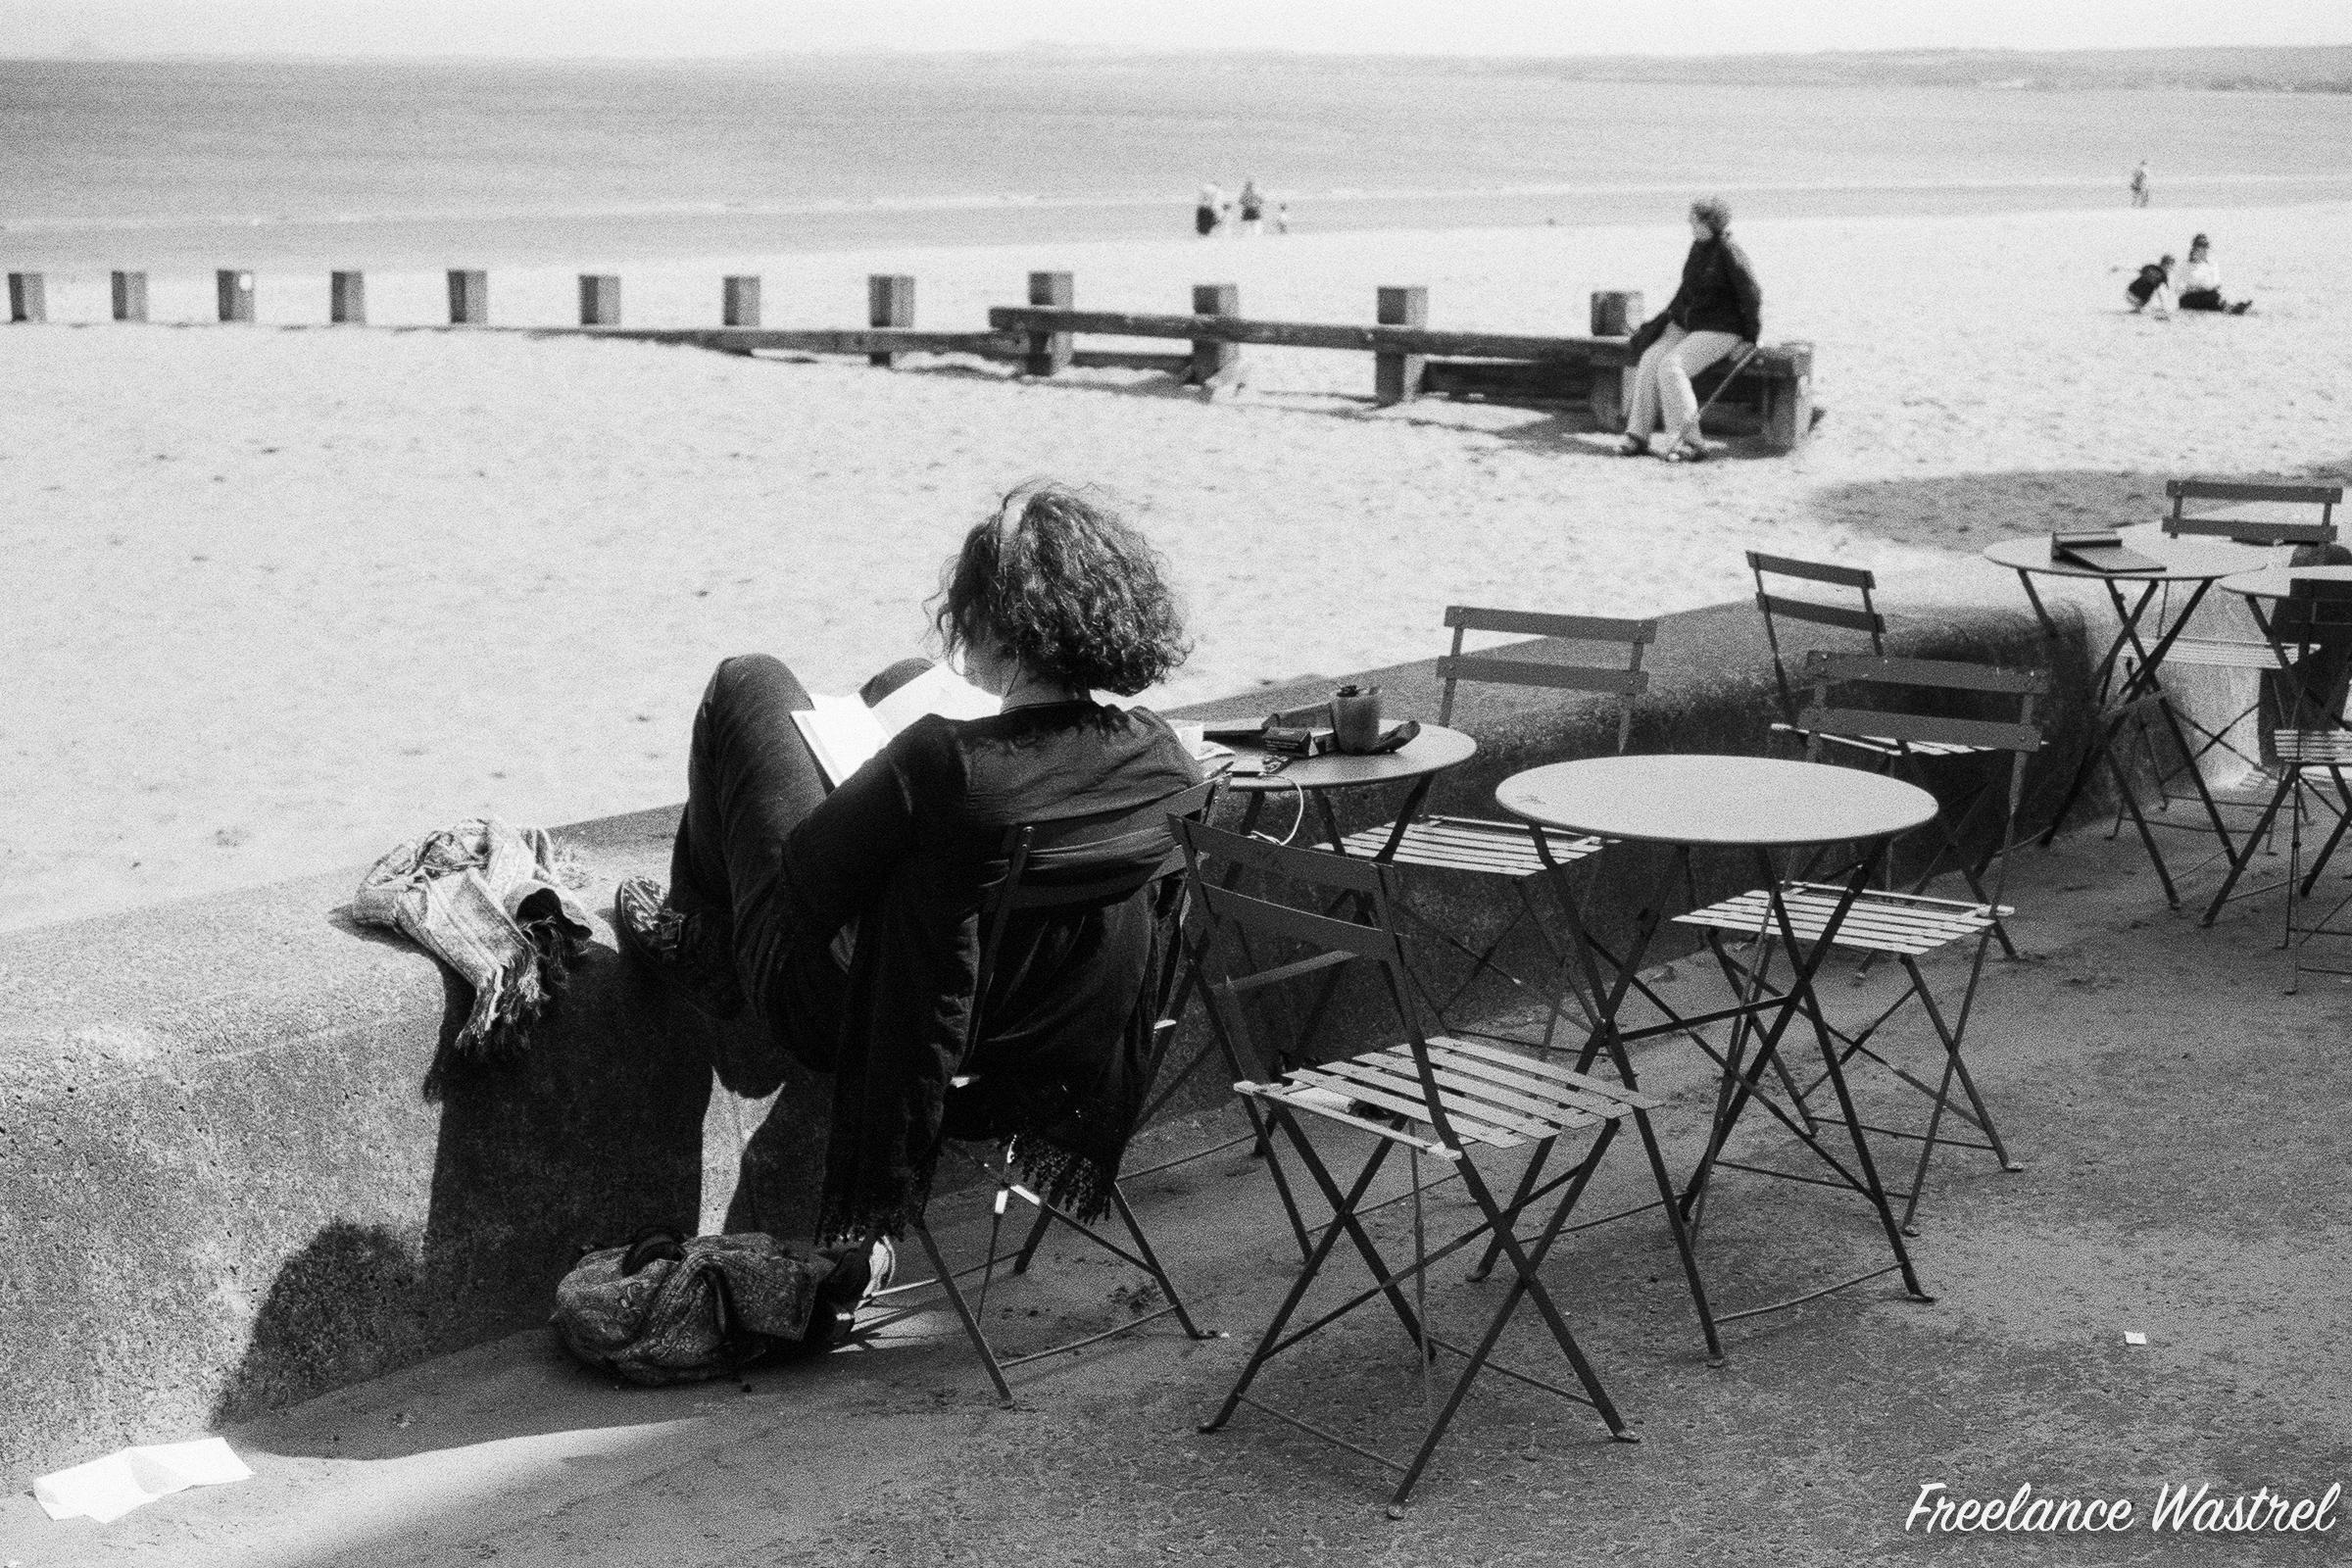 Reading at the beach, Portobello, August 2019